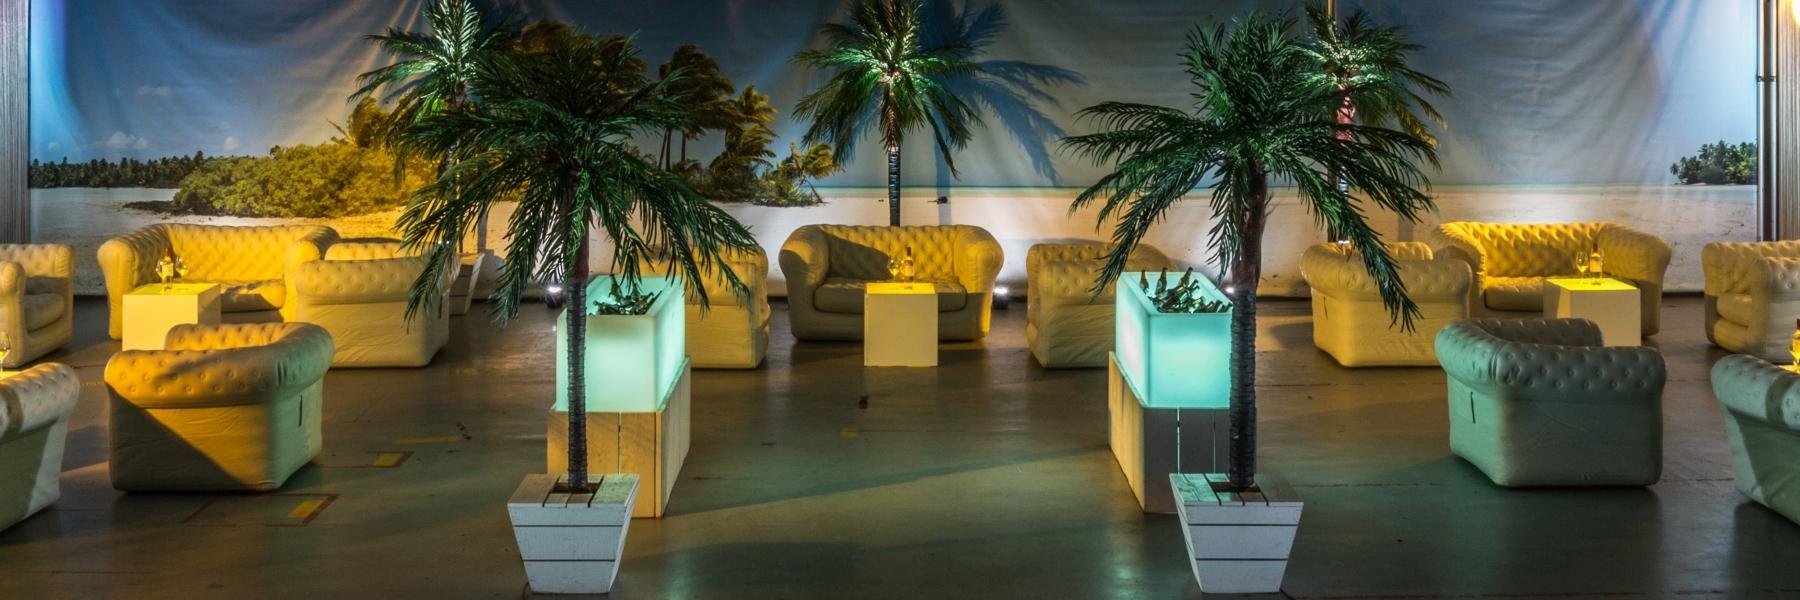 lounge blofield